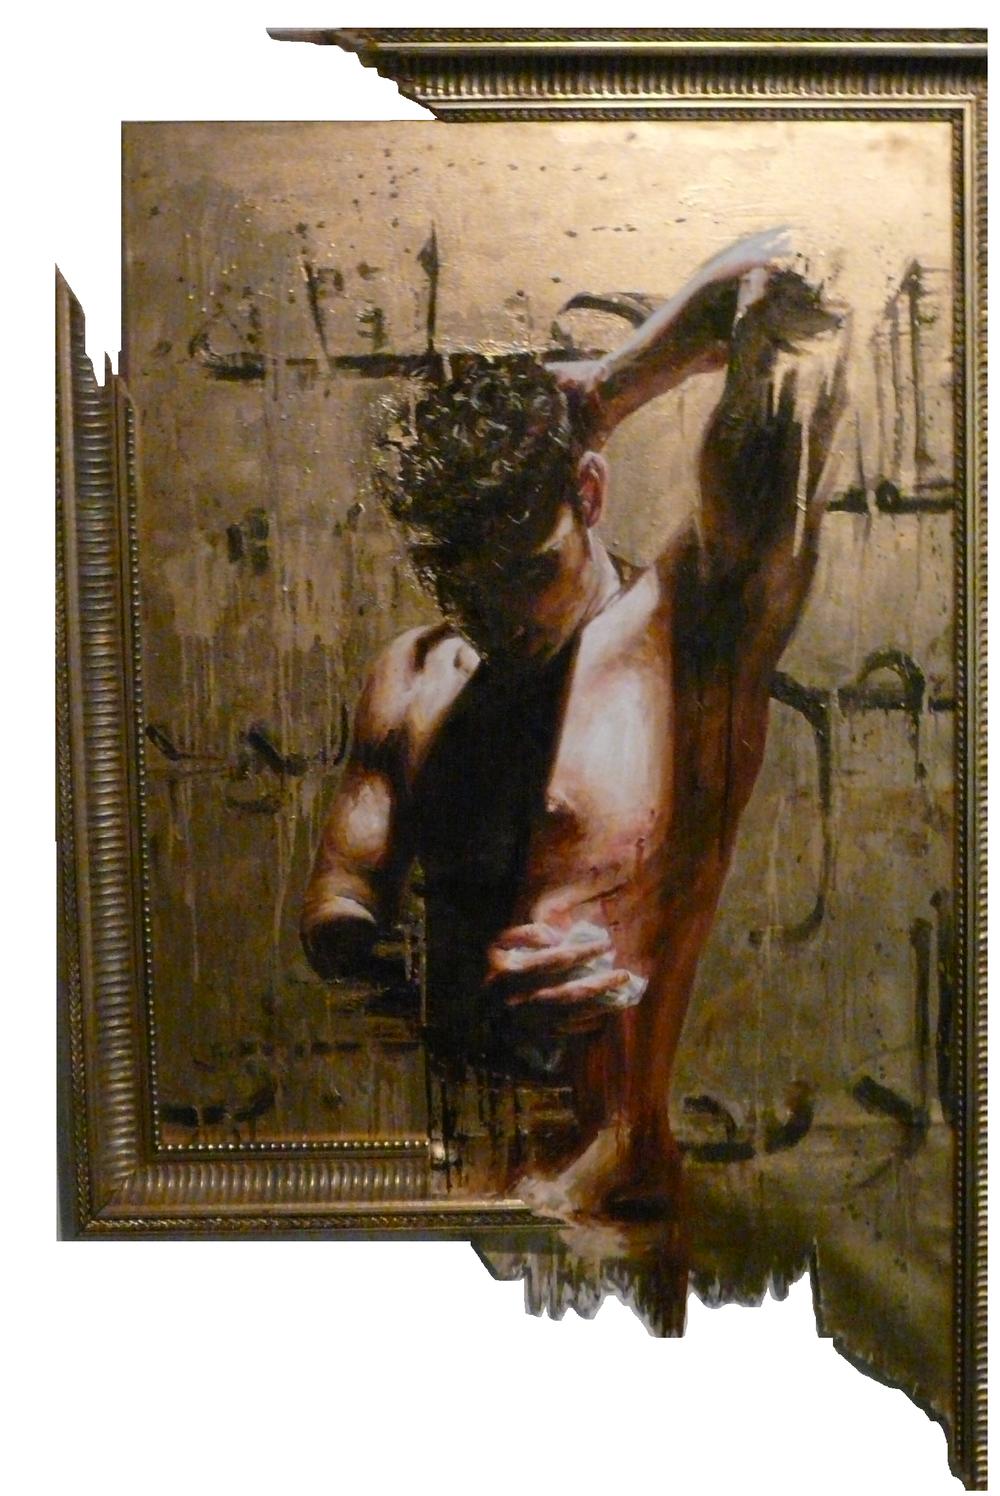 Post Oppression Depression Oil on canvas | 100 x 85cm